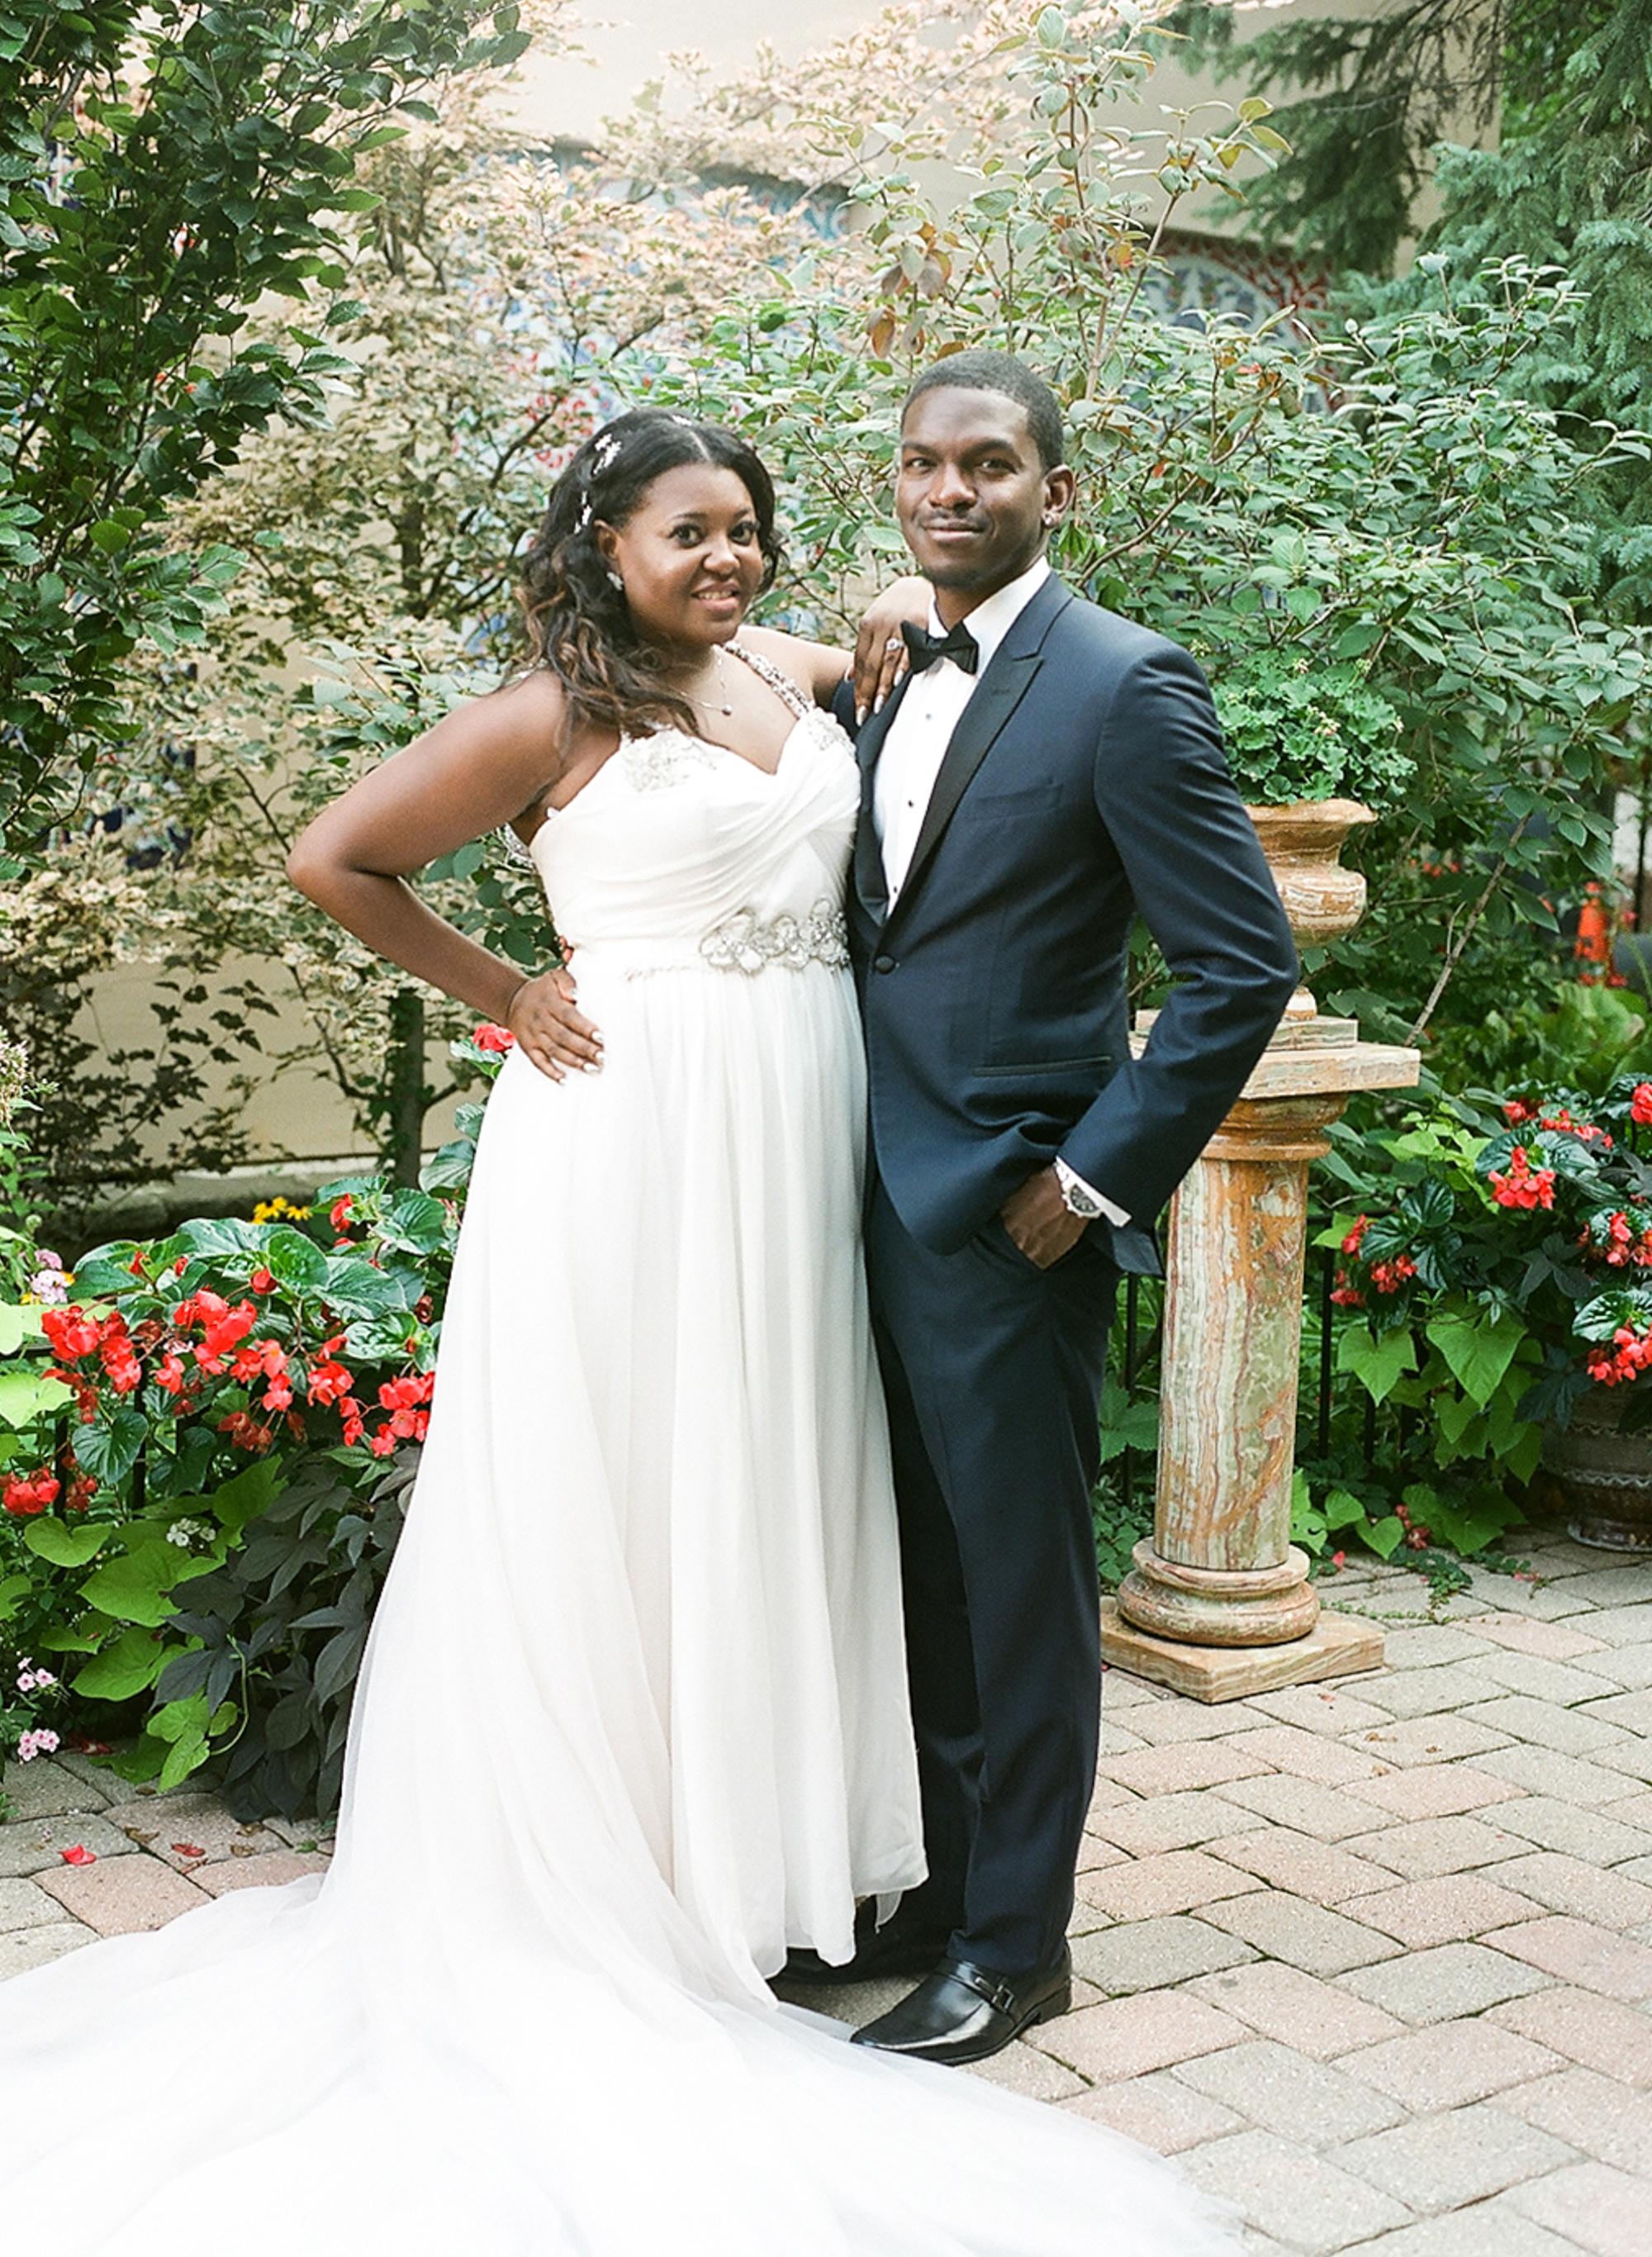 Bonphotage Chicago Fine Art Wedding Photography - Galleria Marchetti